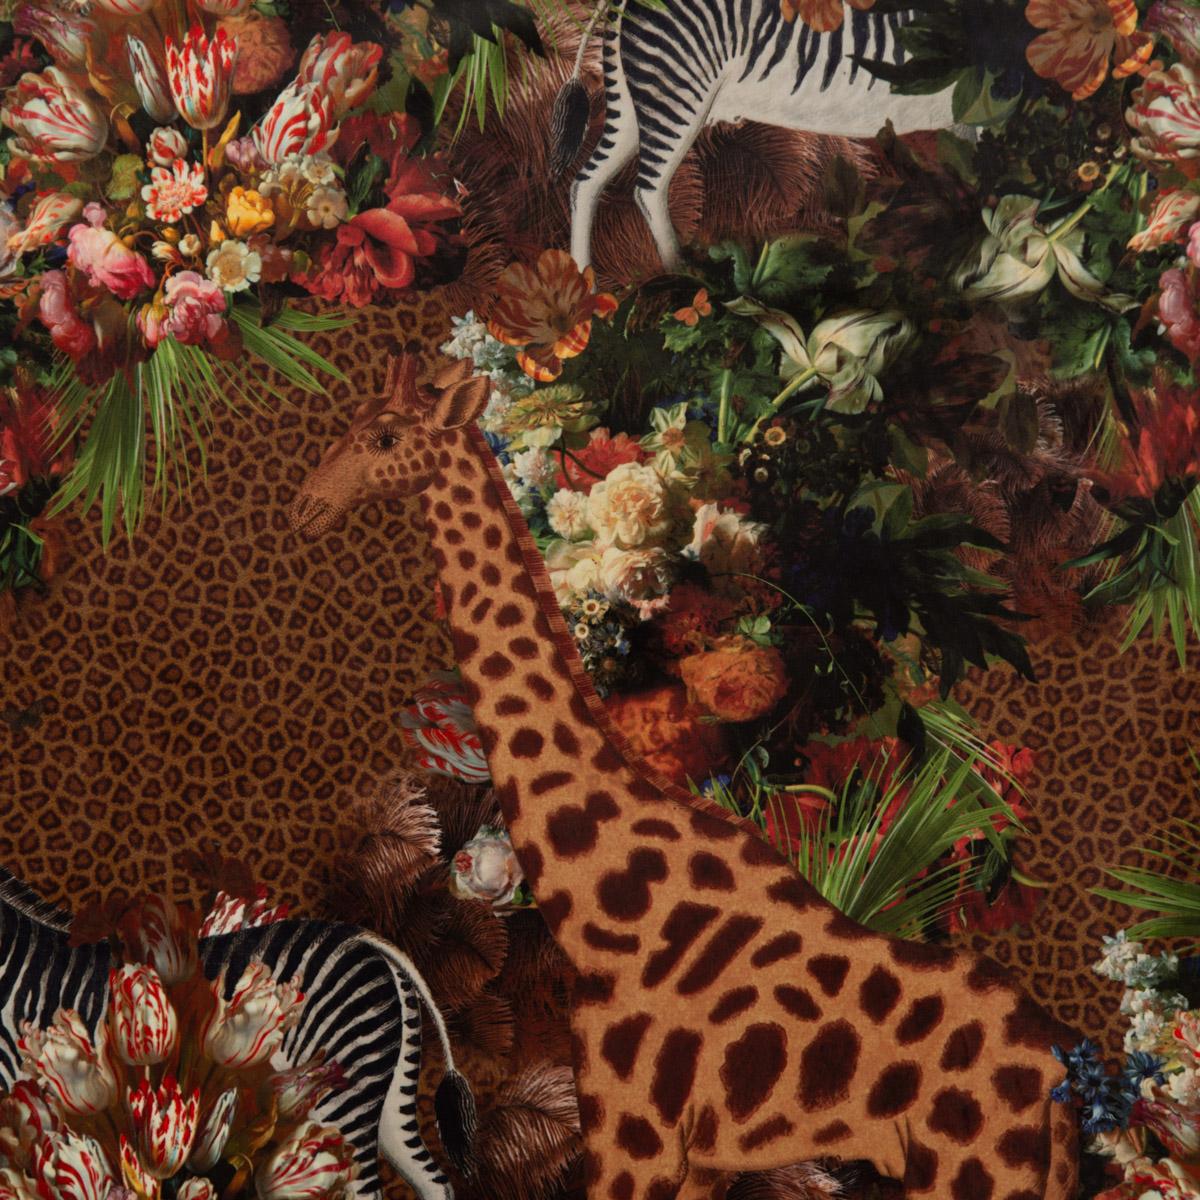 Samtstoff Dekostoff Velvet Deluxe Samt Zebra Giraffe Blumen braun bunt 1,4m Breite